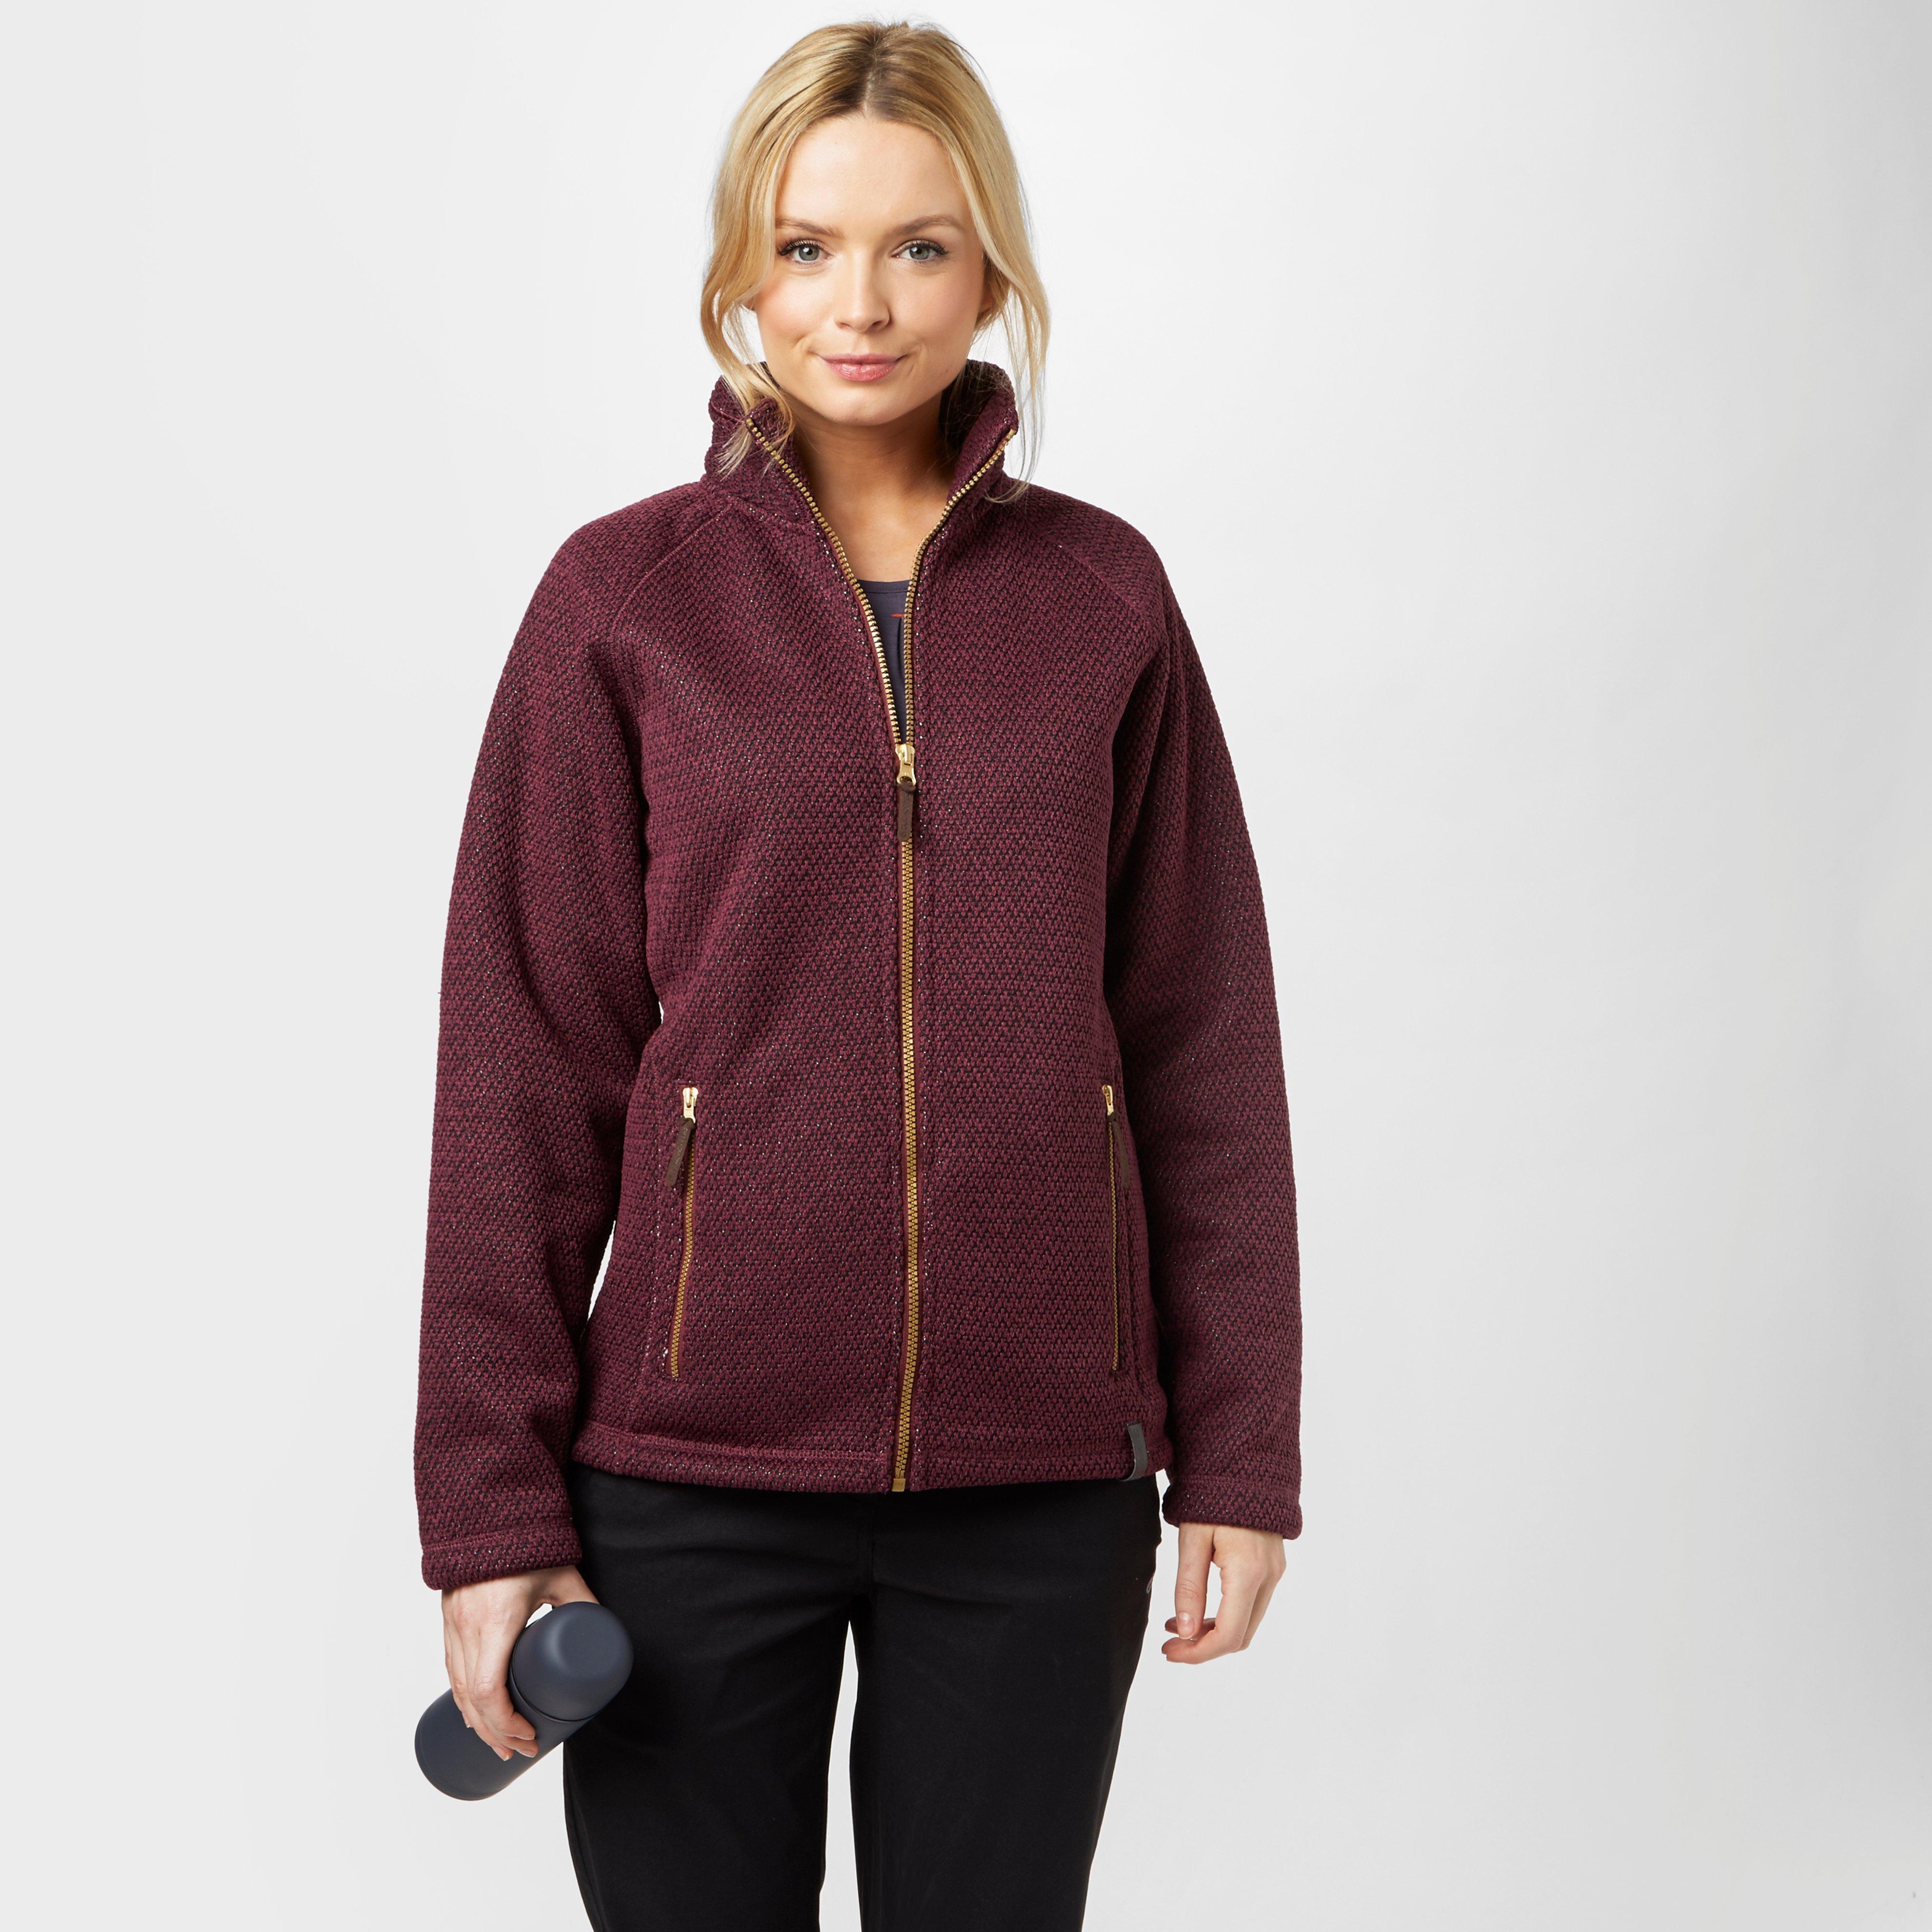 Craghoppers Craghoppers womens Cayton Fleece Jacket - Purple, Purple